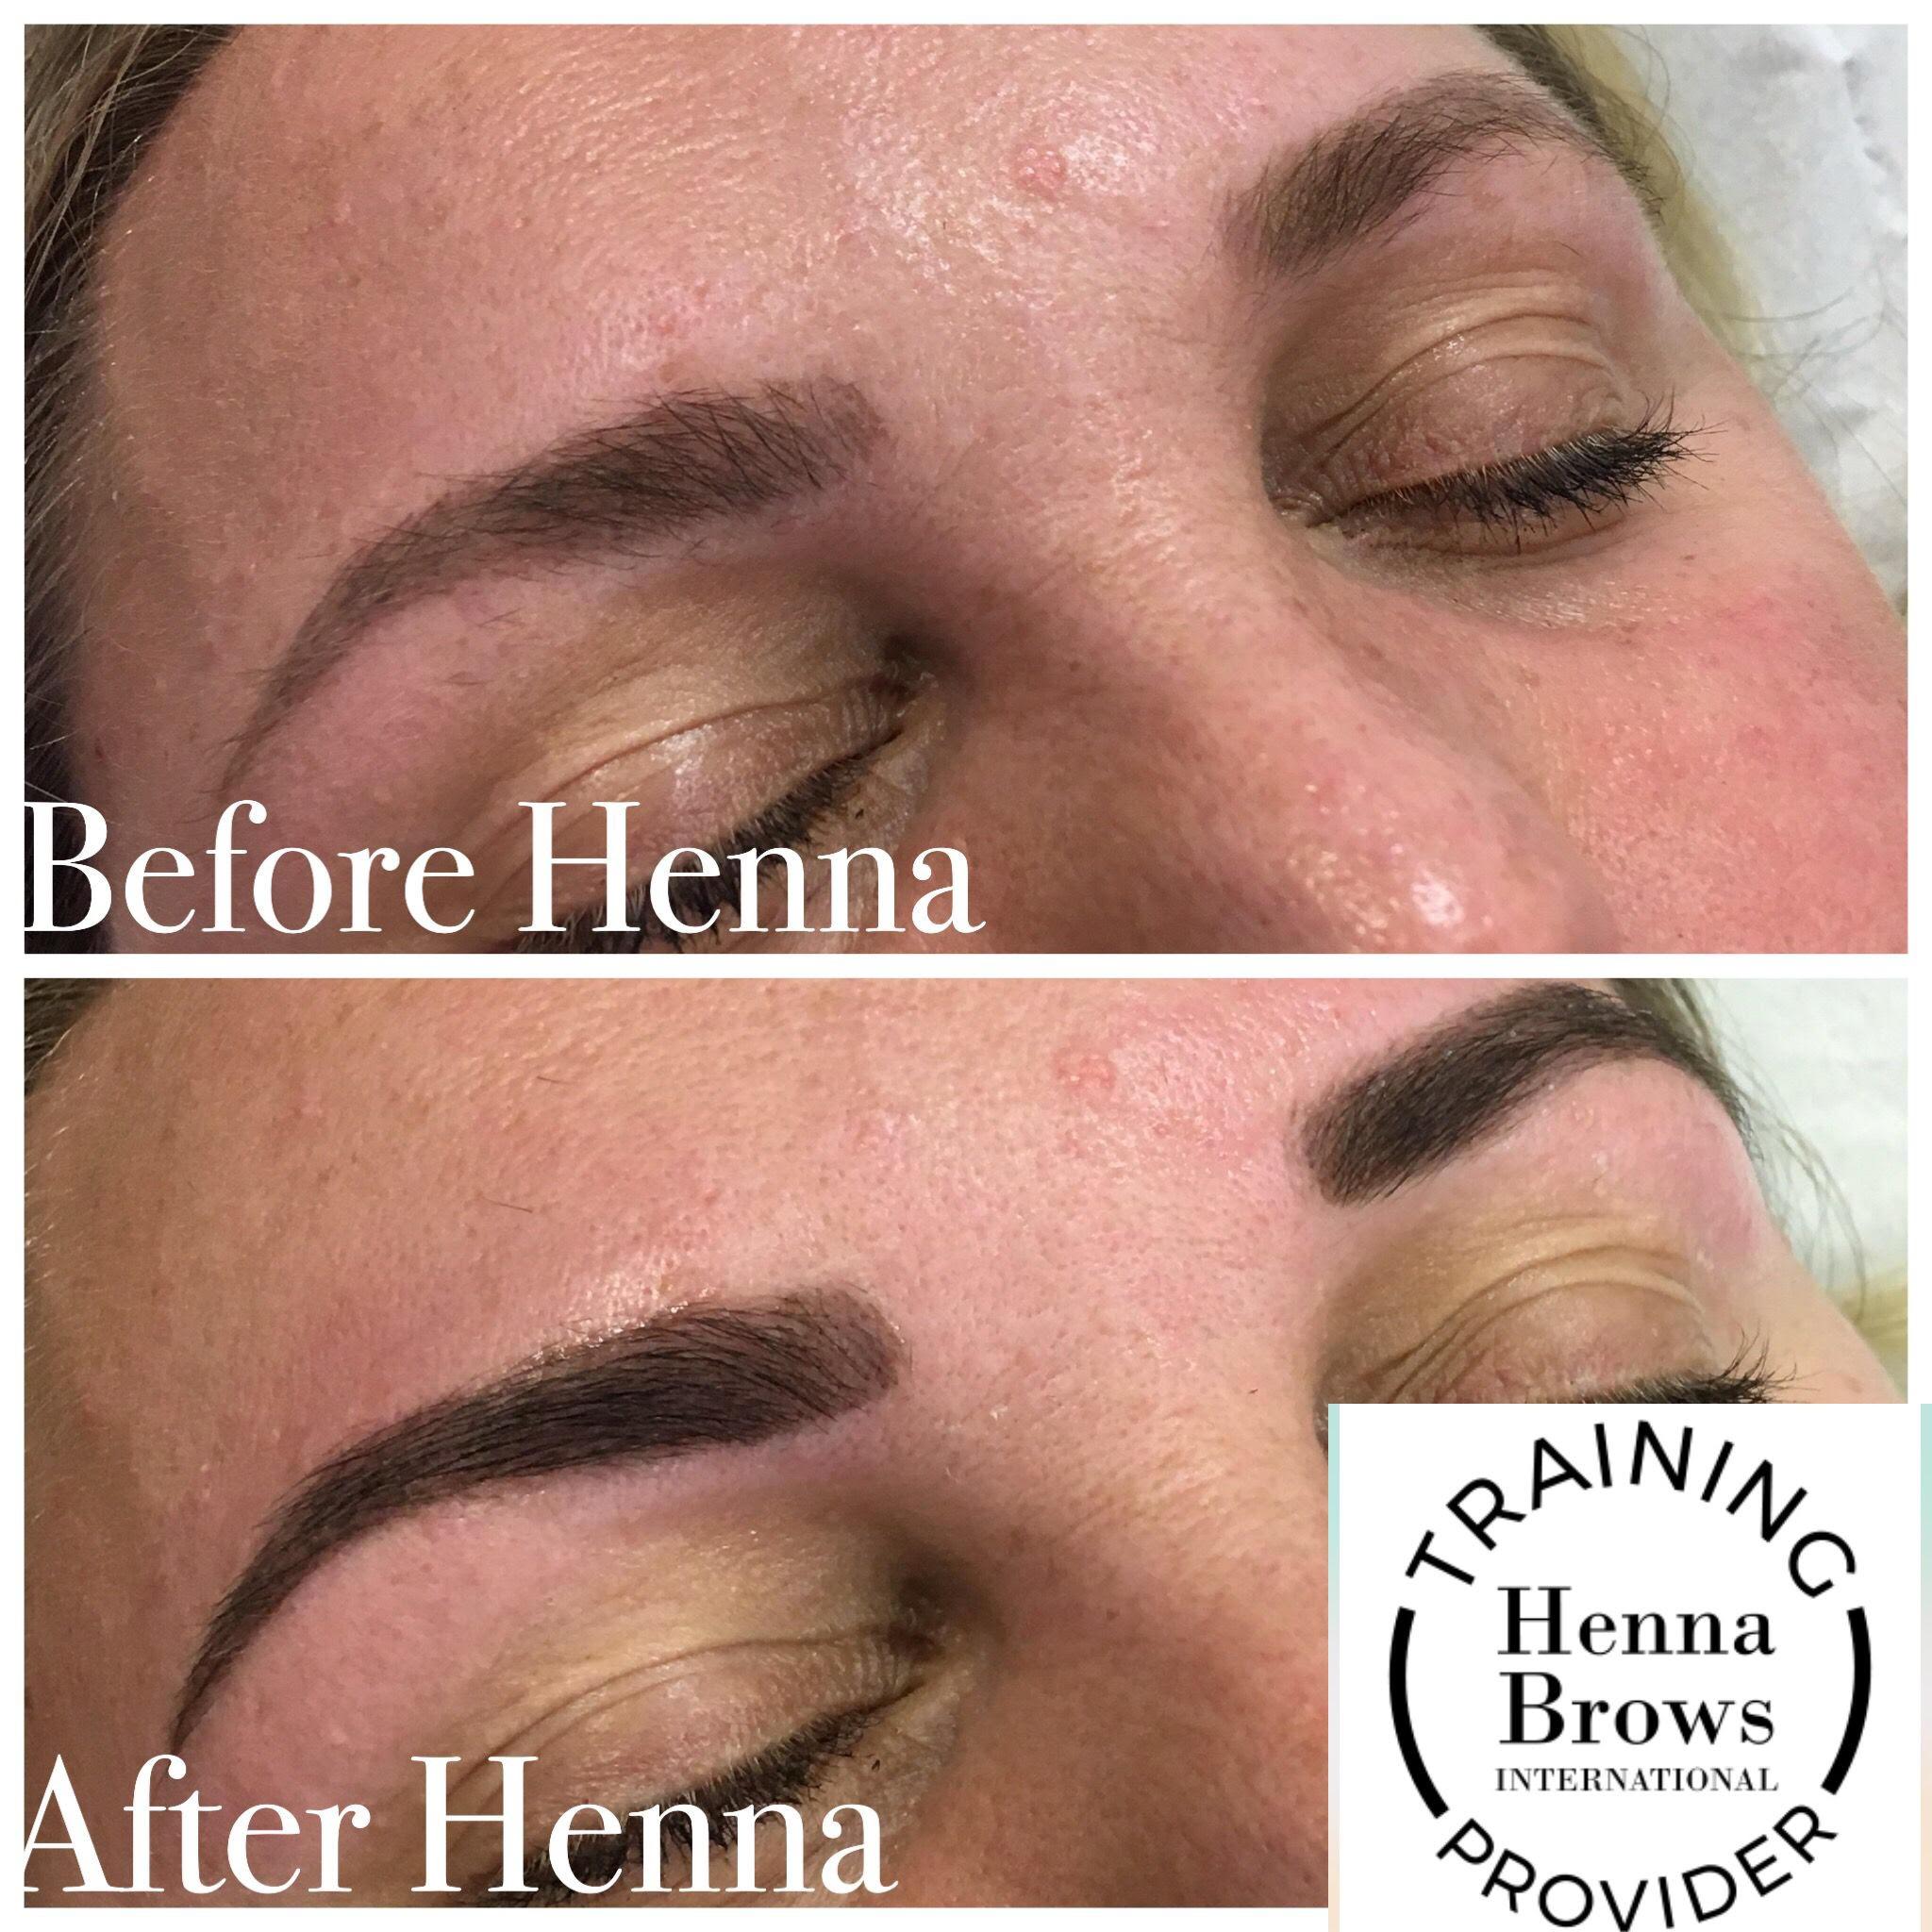 Eyebrow Wax And Tint Course Perth The Eyebrow